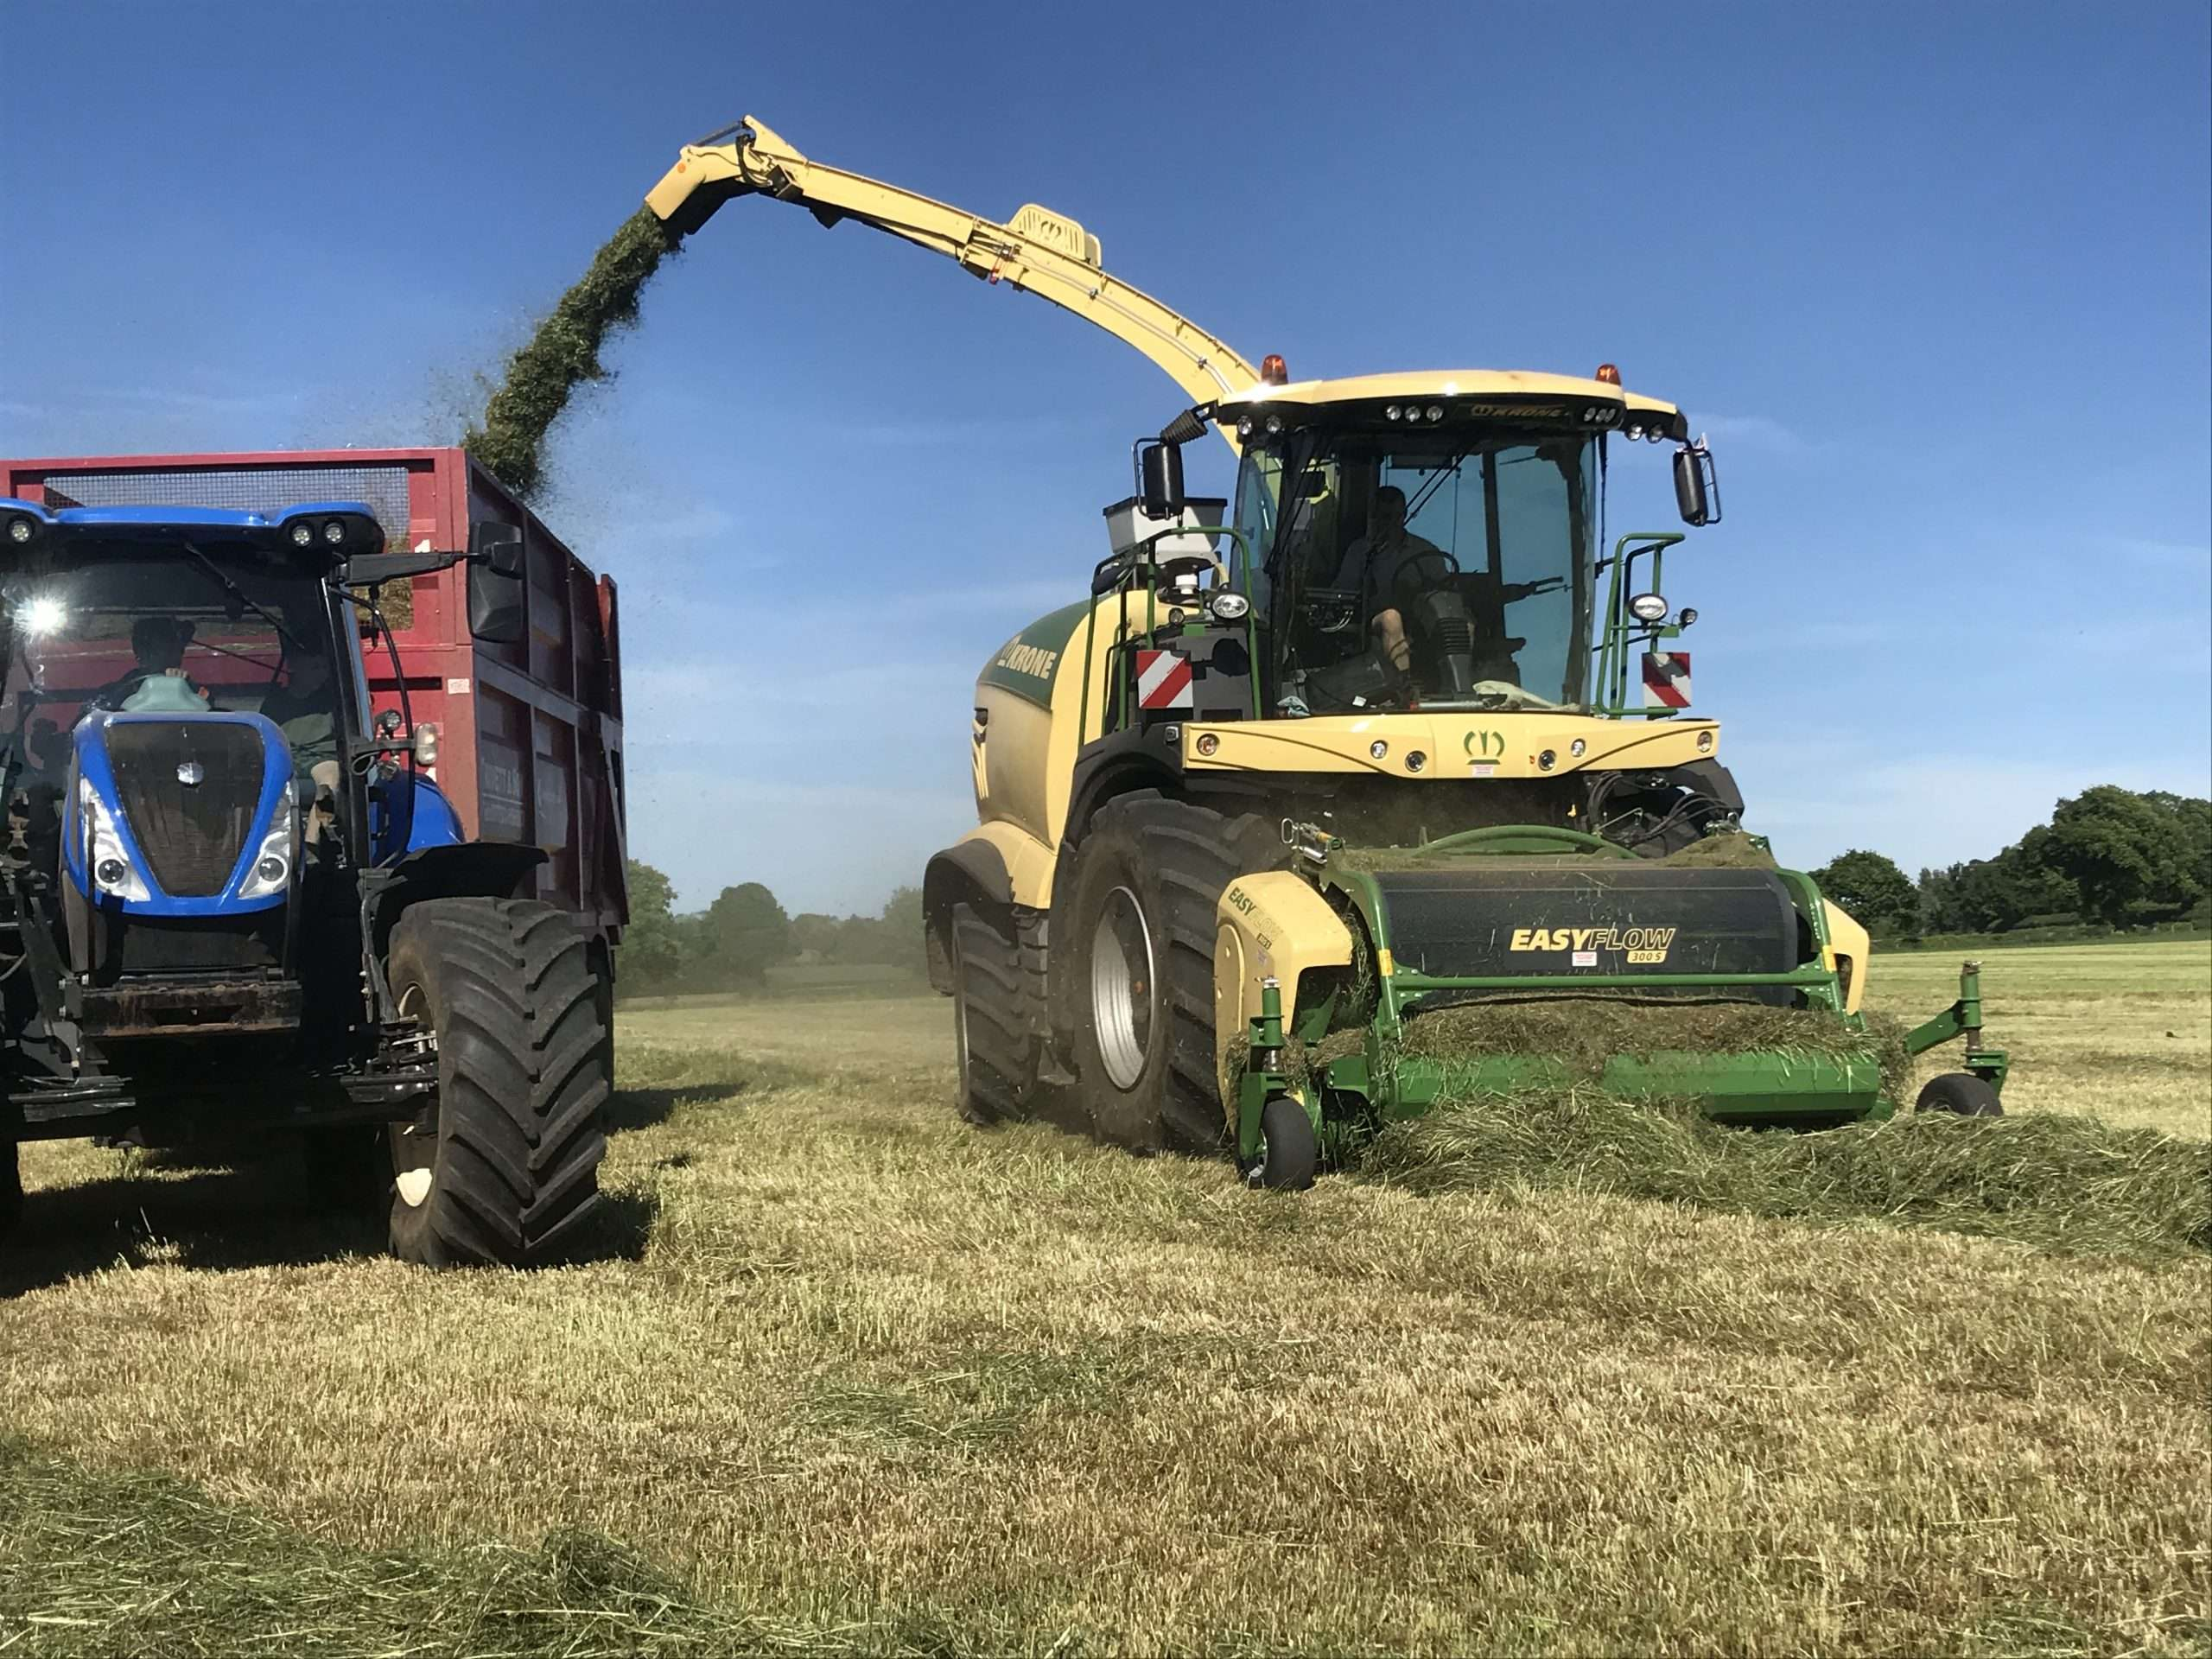 machinery in field